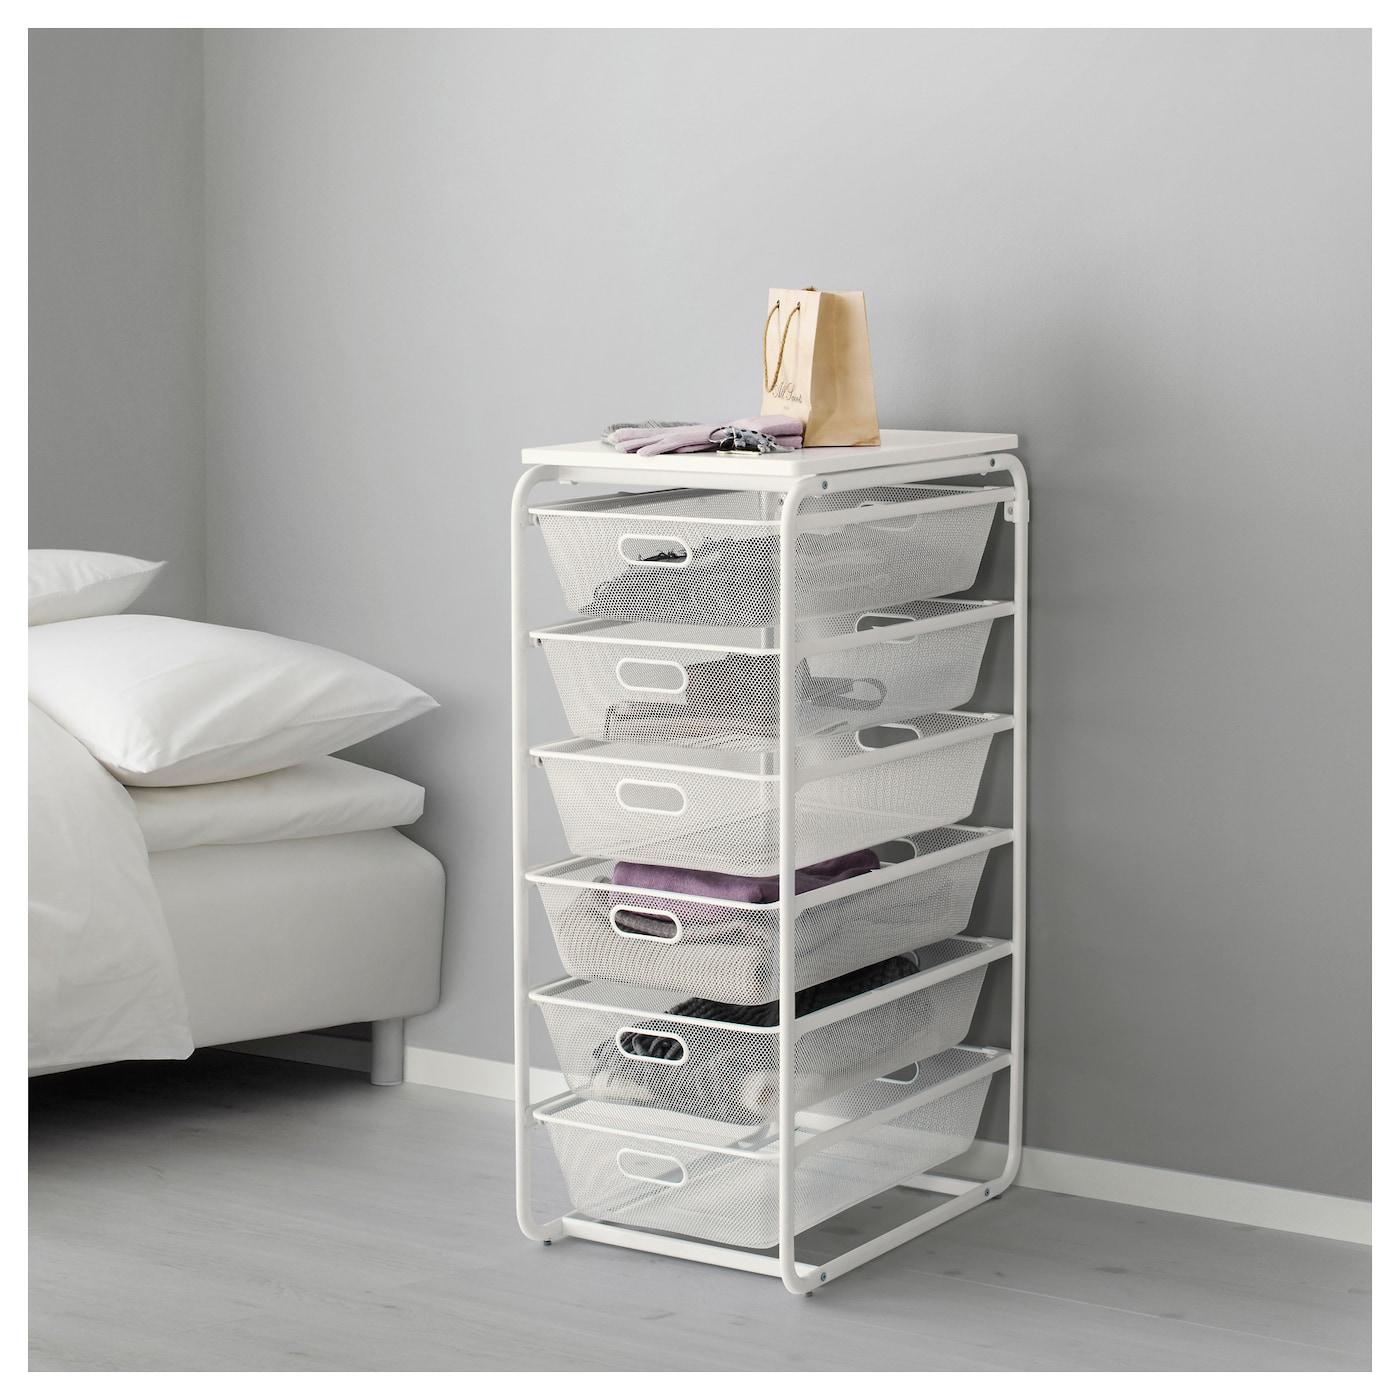 ALGOT Frame/6 mesh baskets/top shelf White 41x60x105 cm - IKEA